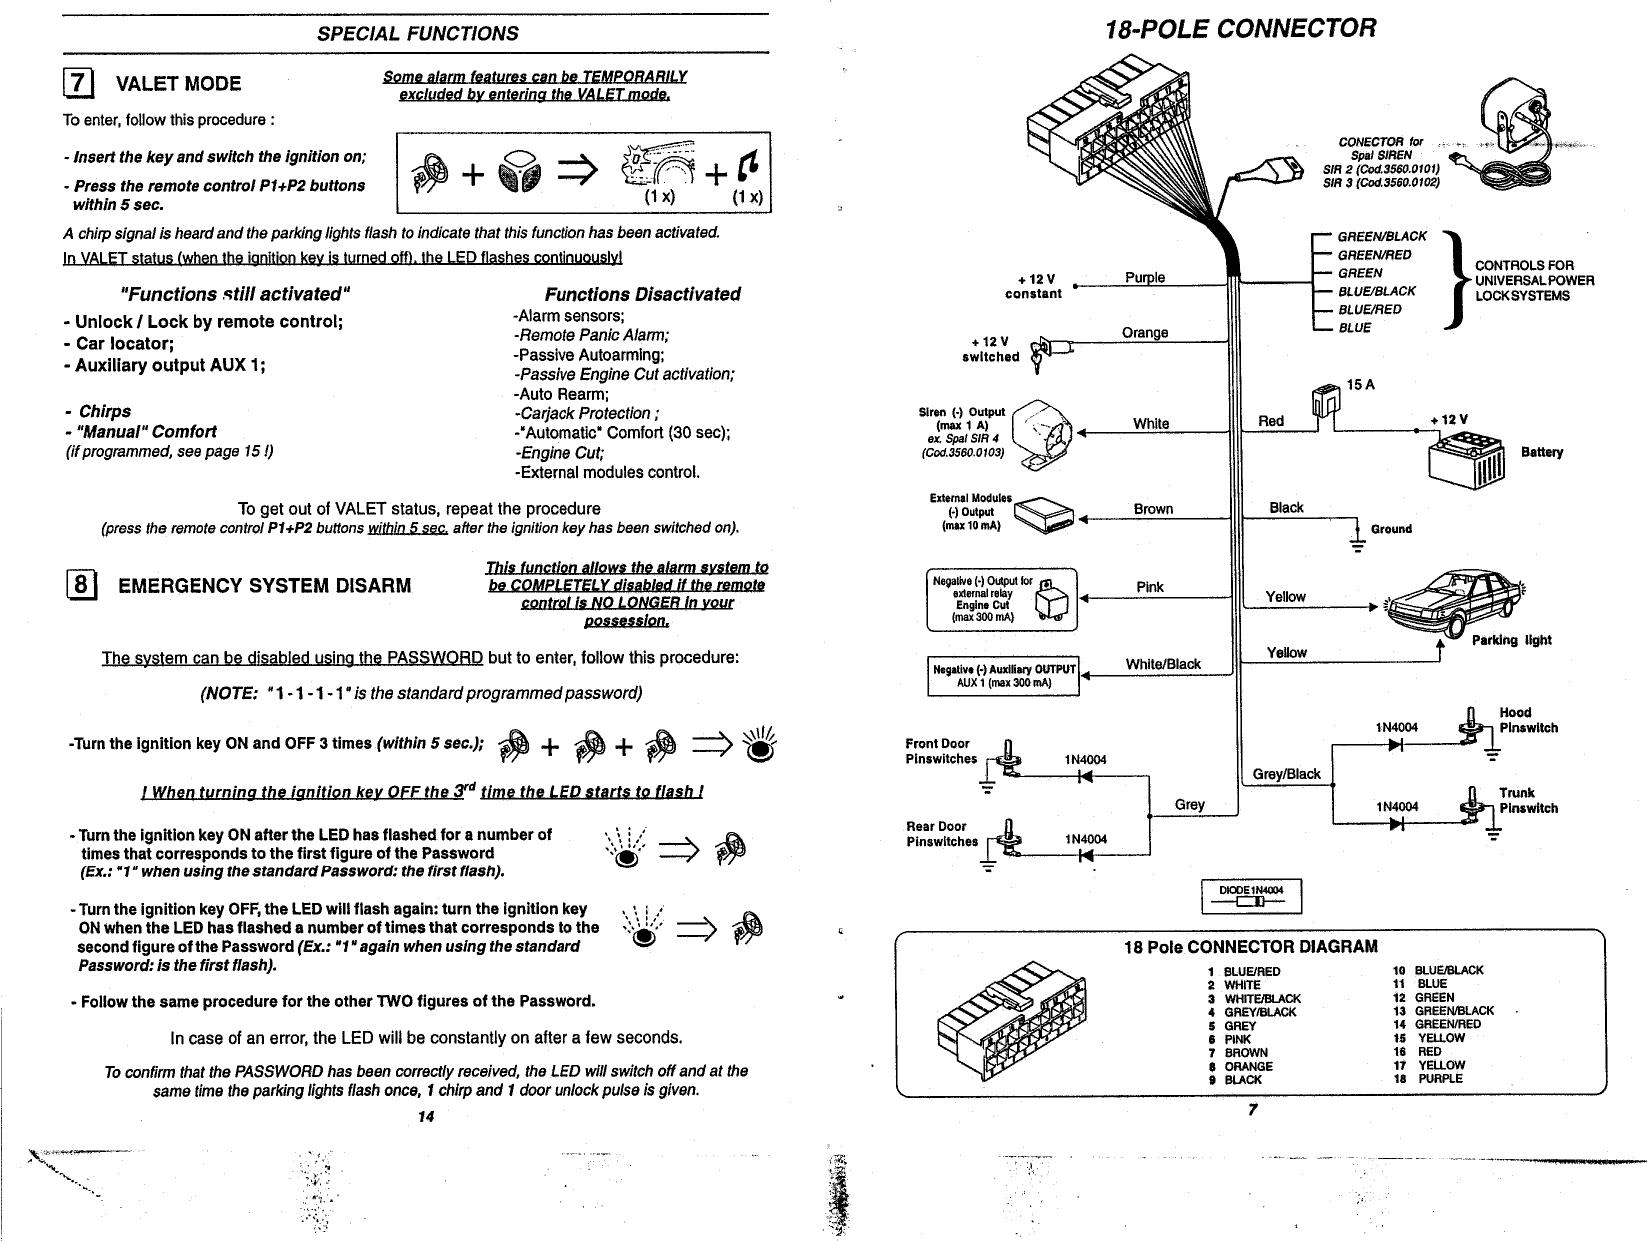 Hz 2987  Audi 80 Central Locking And Alarm Control Unit Wiring Diagram Download Diagram